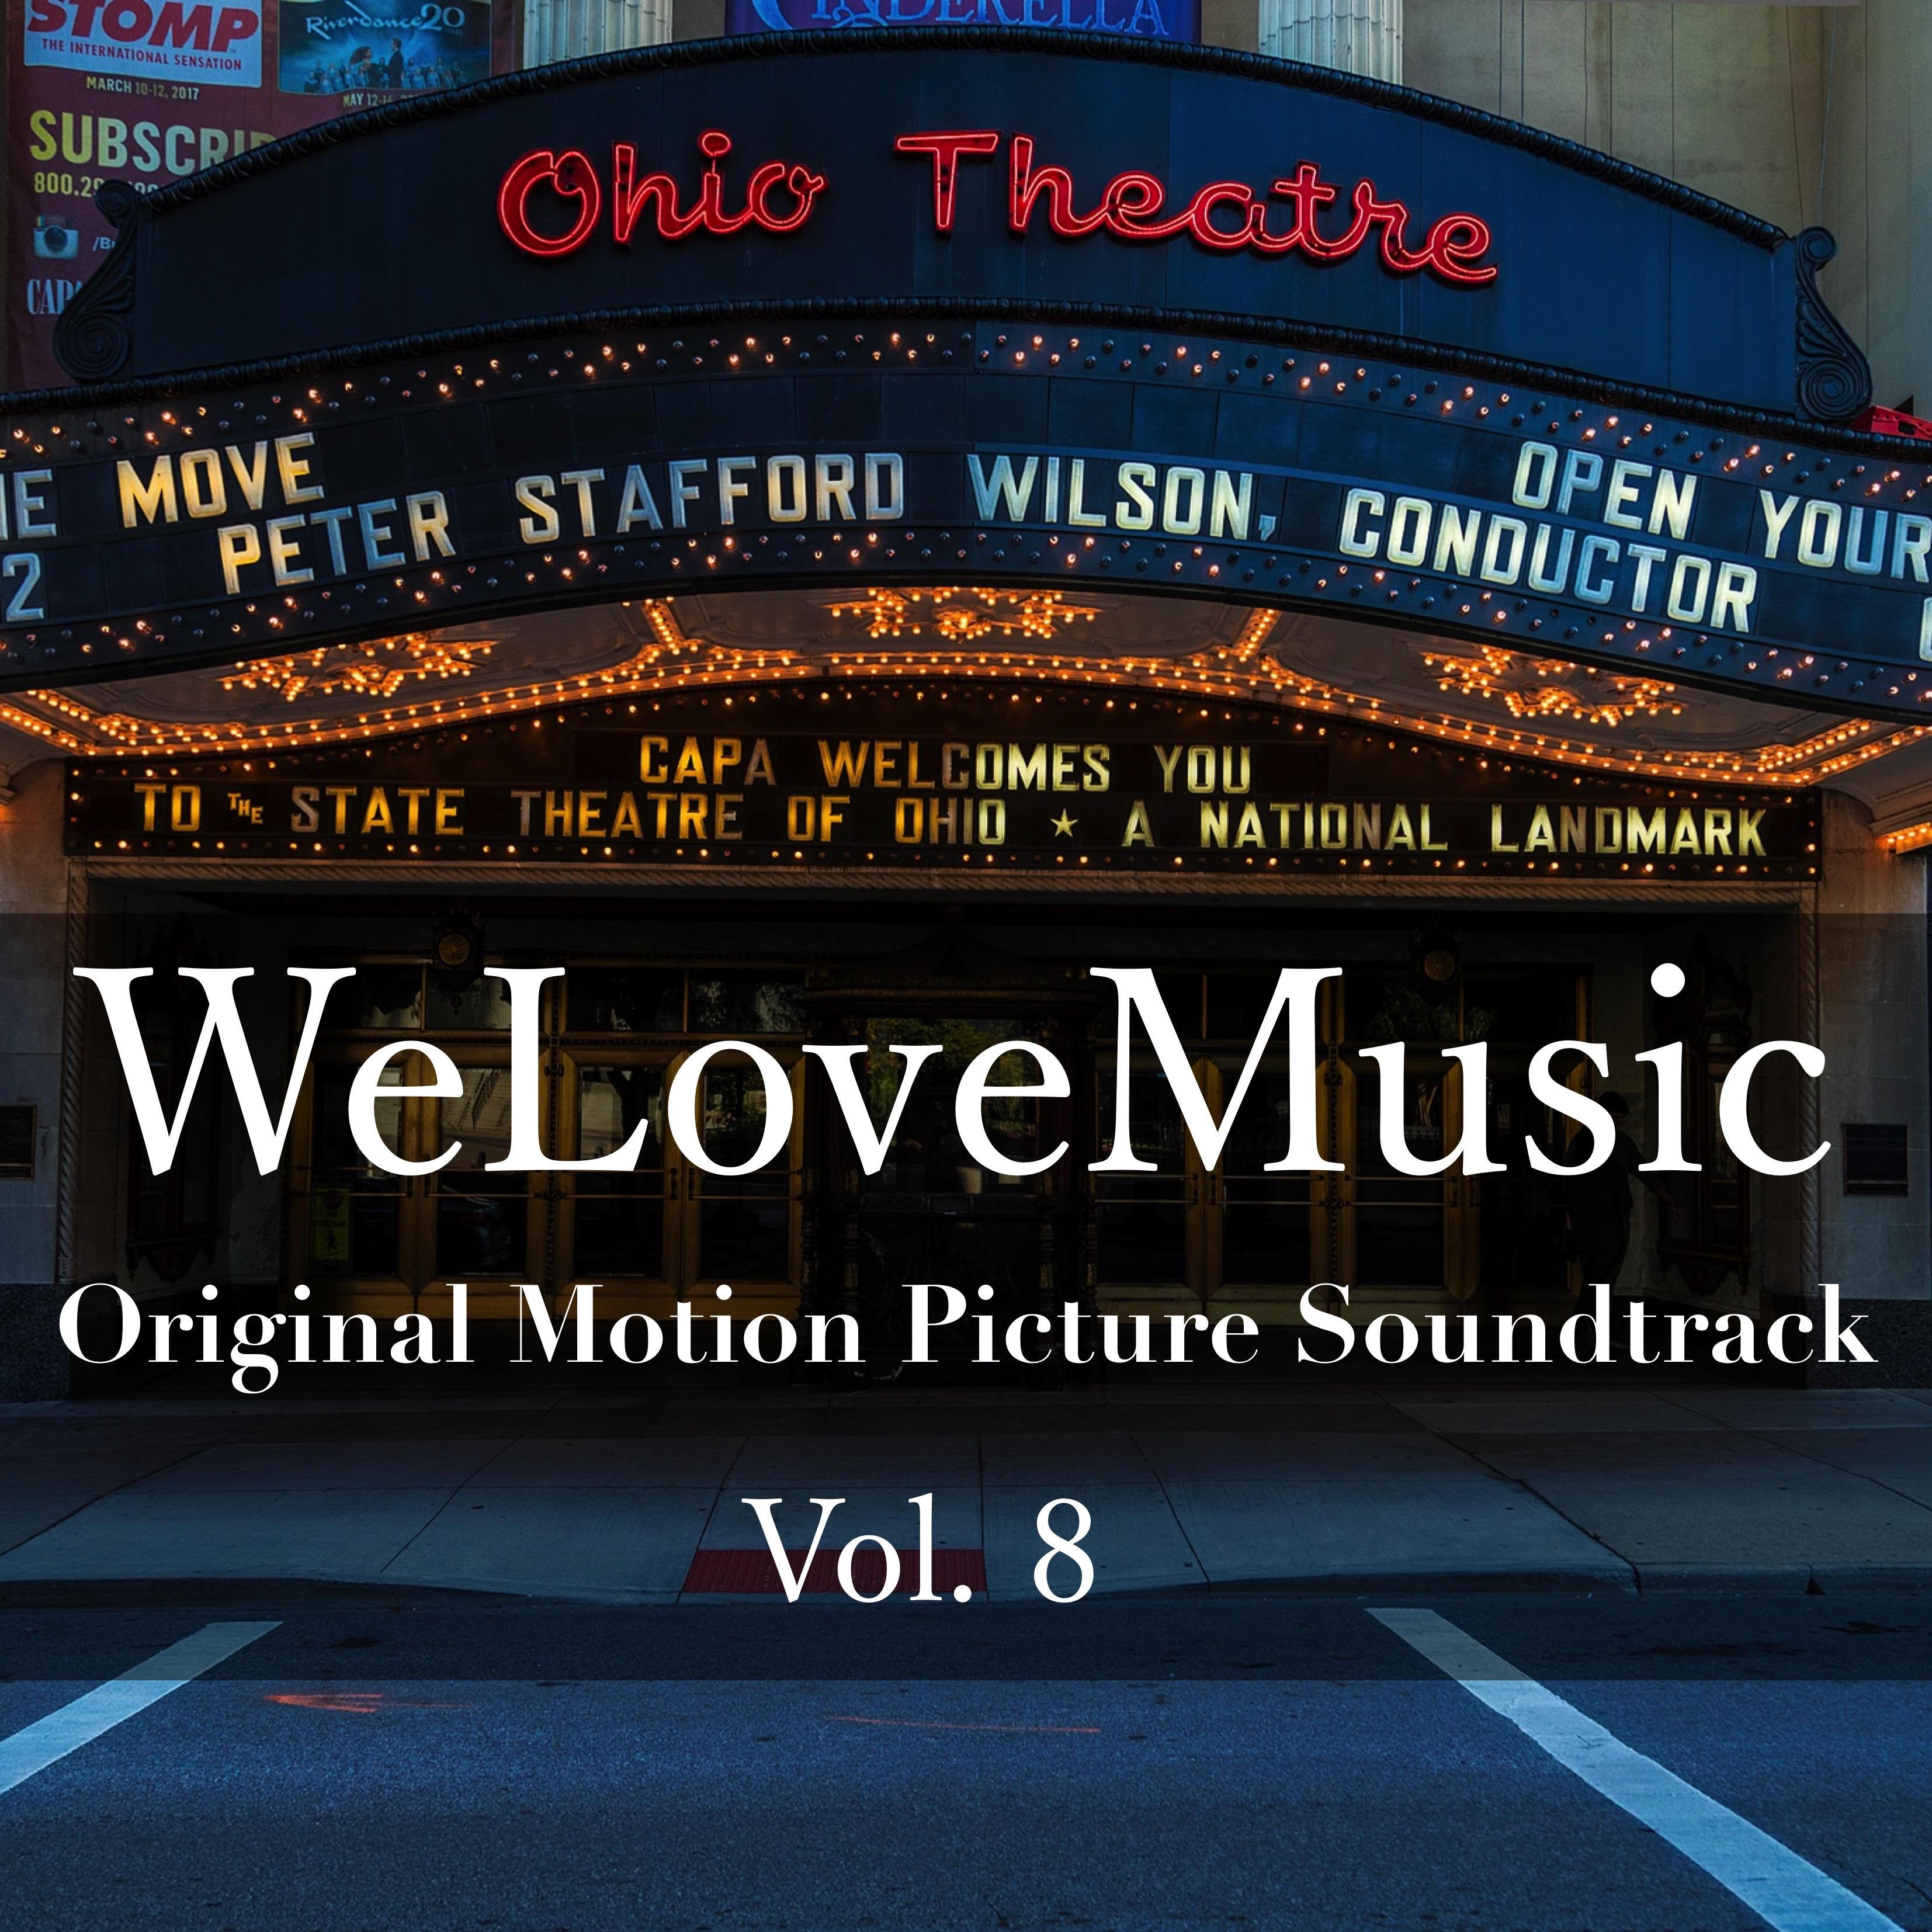 Film Compilation cover, orig. motion picture soundtrack